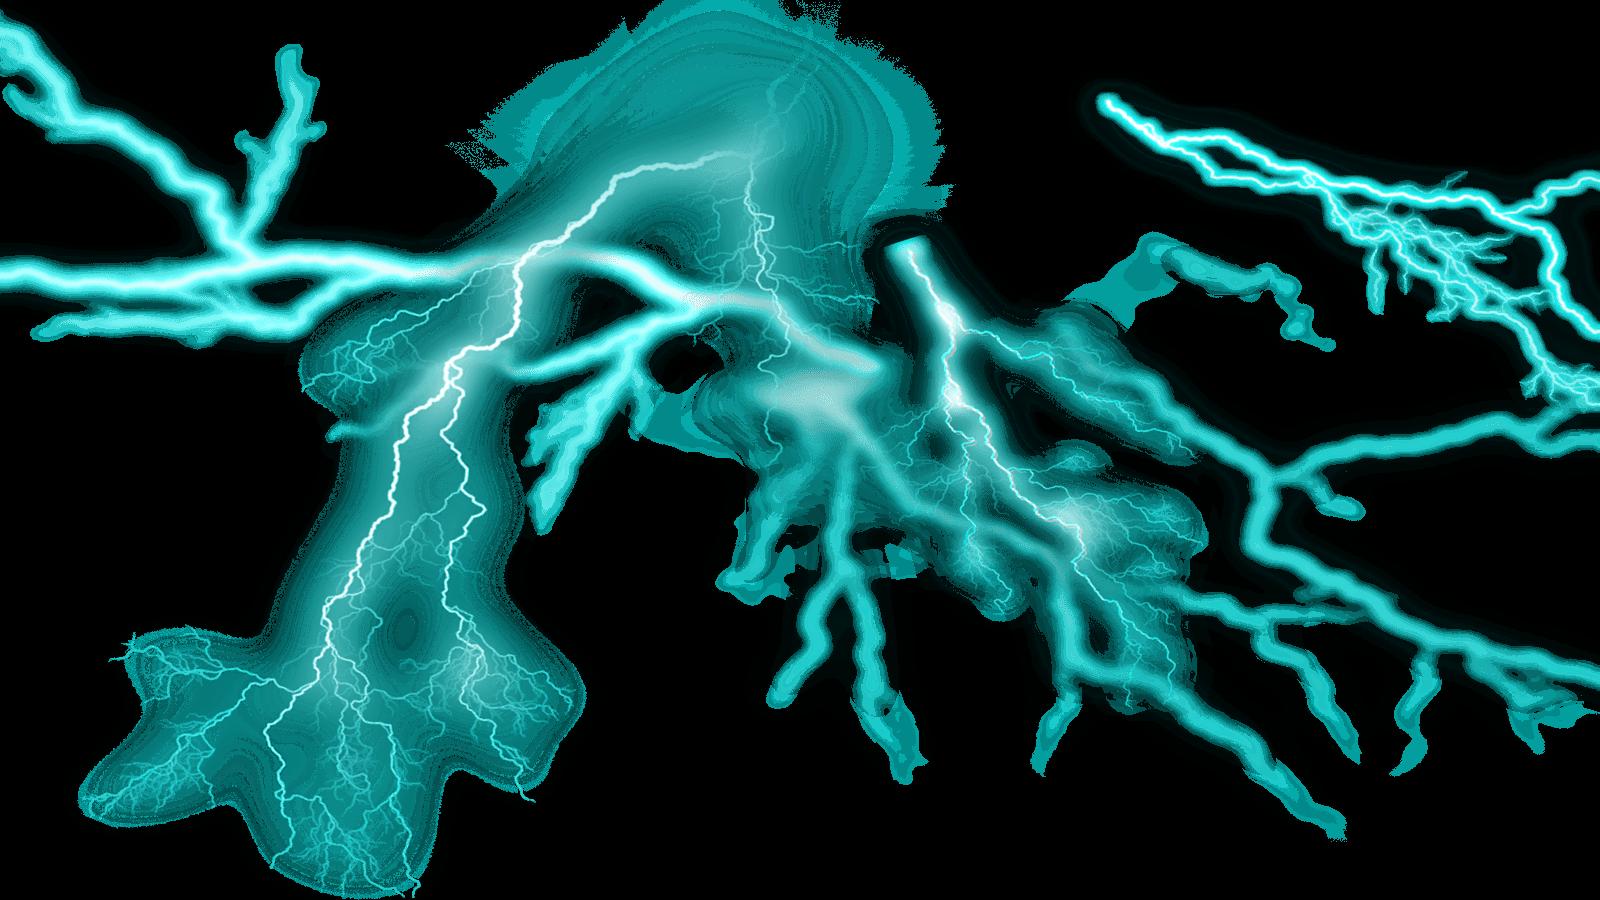 Thunder transparent PNG.